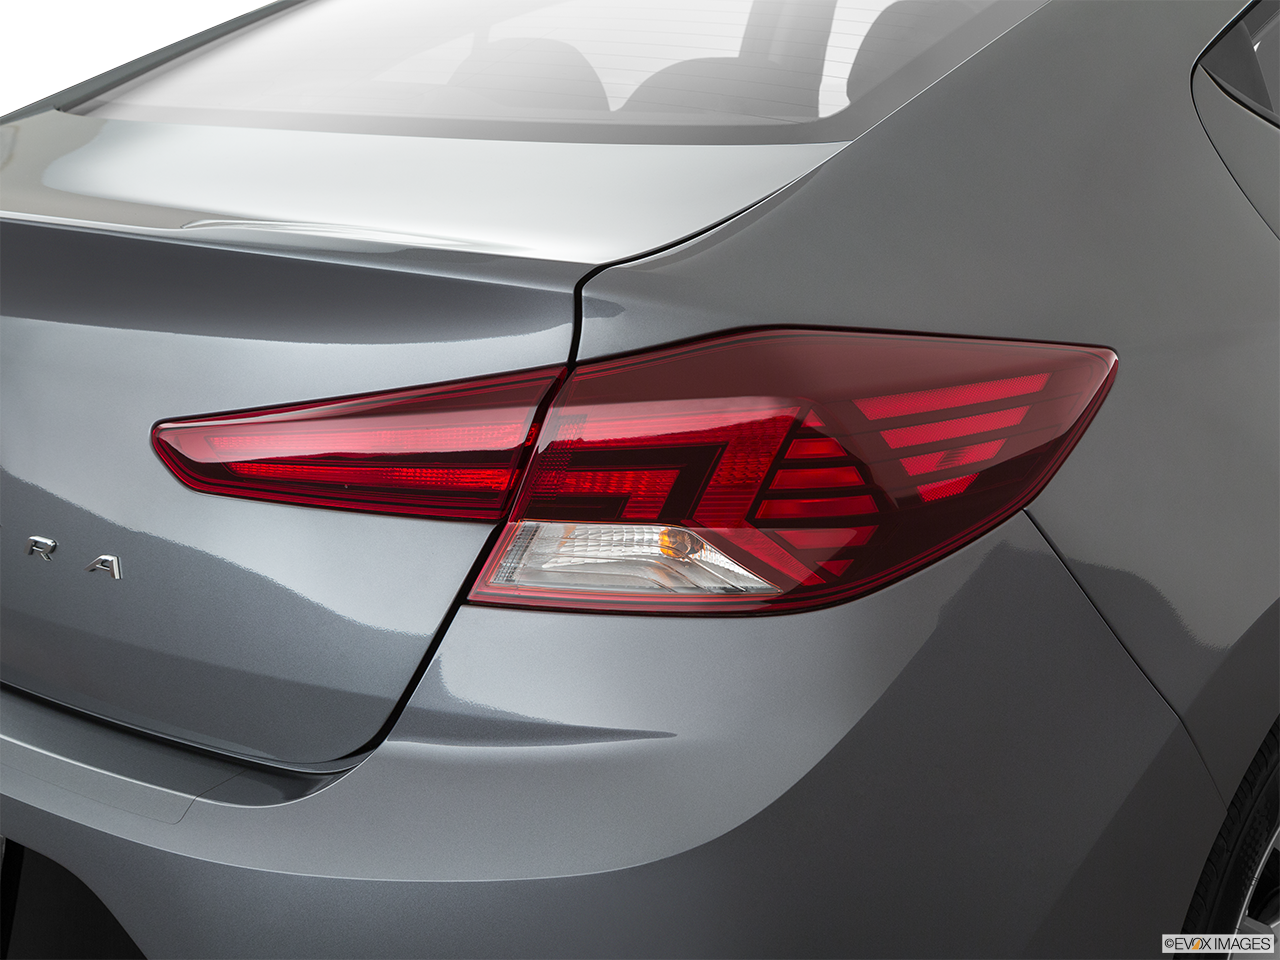 2020 Hyundai Elantra photo